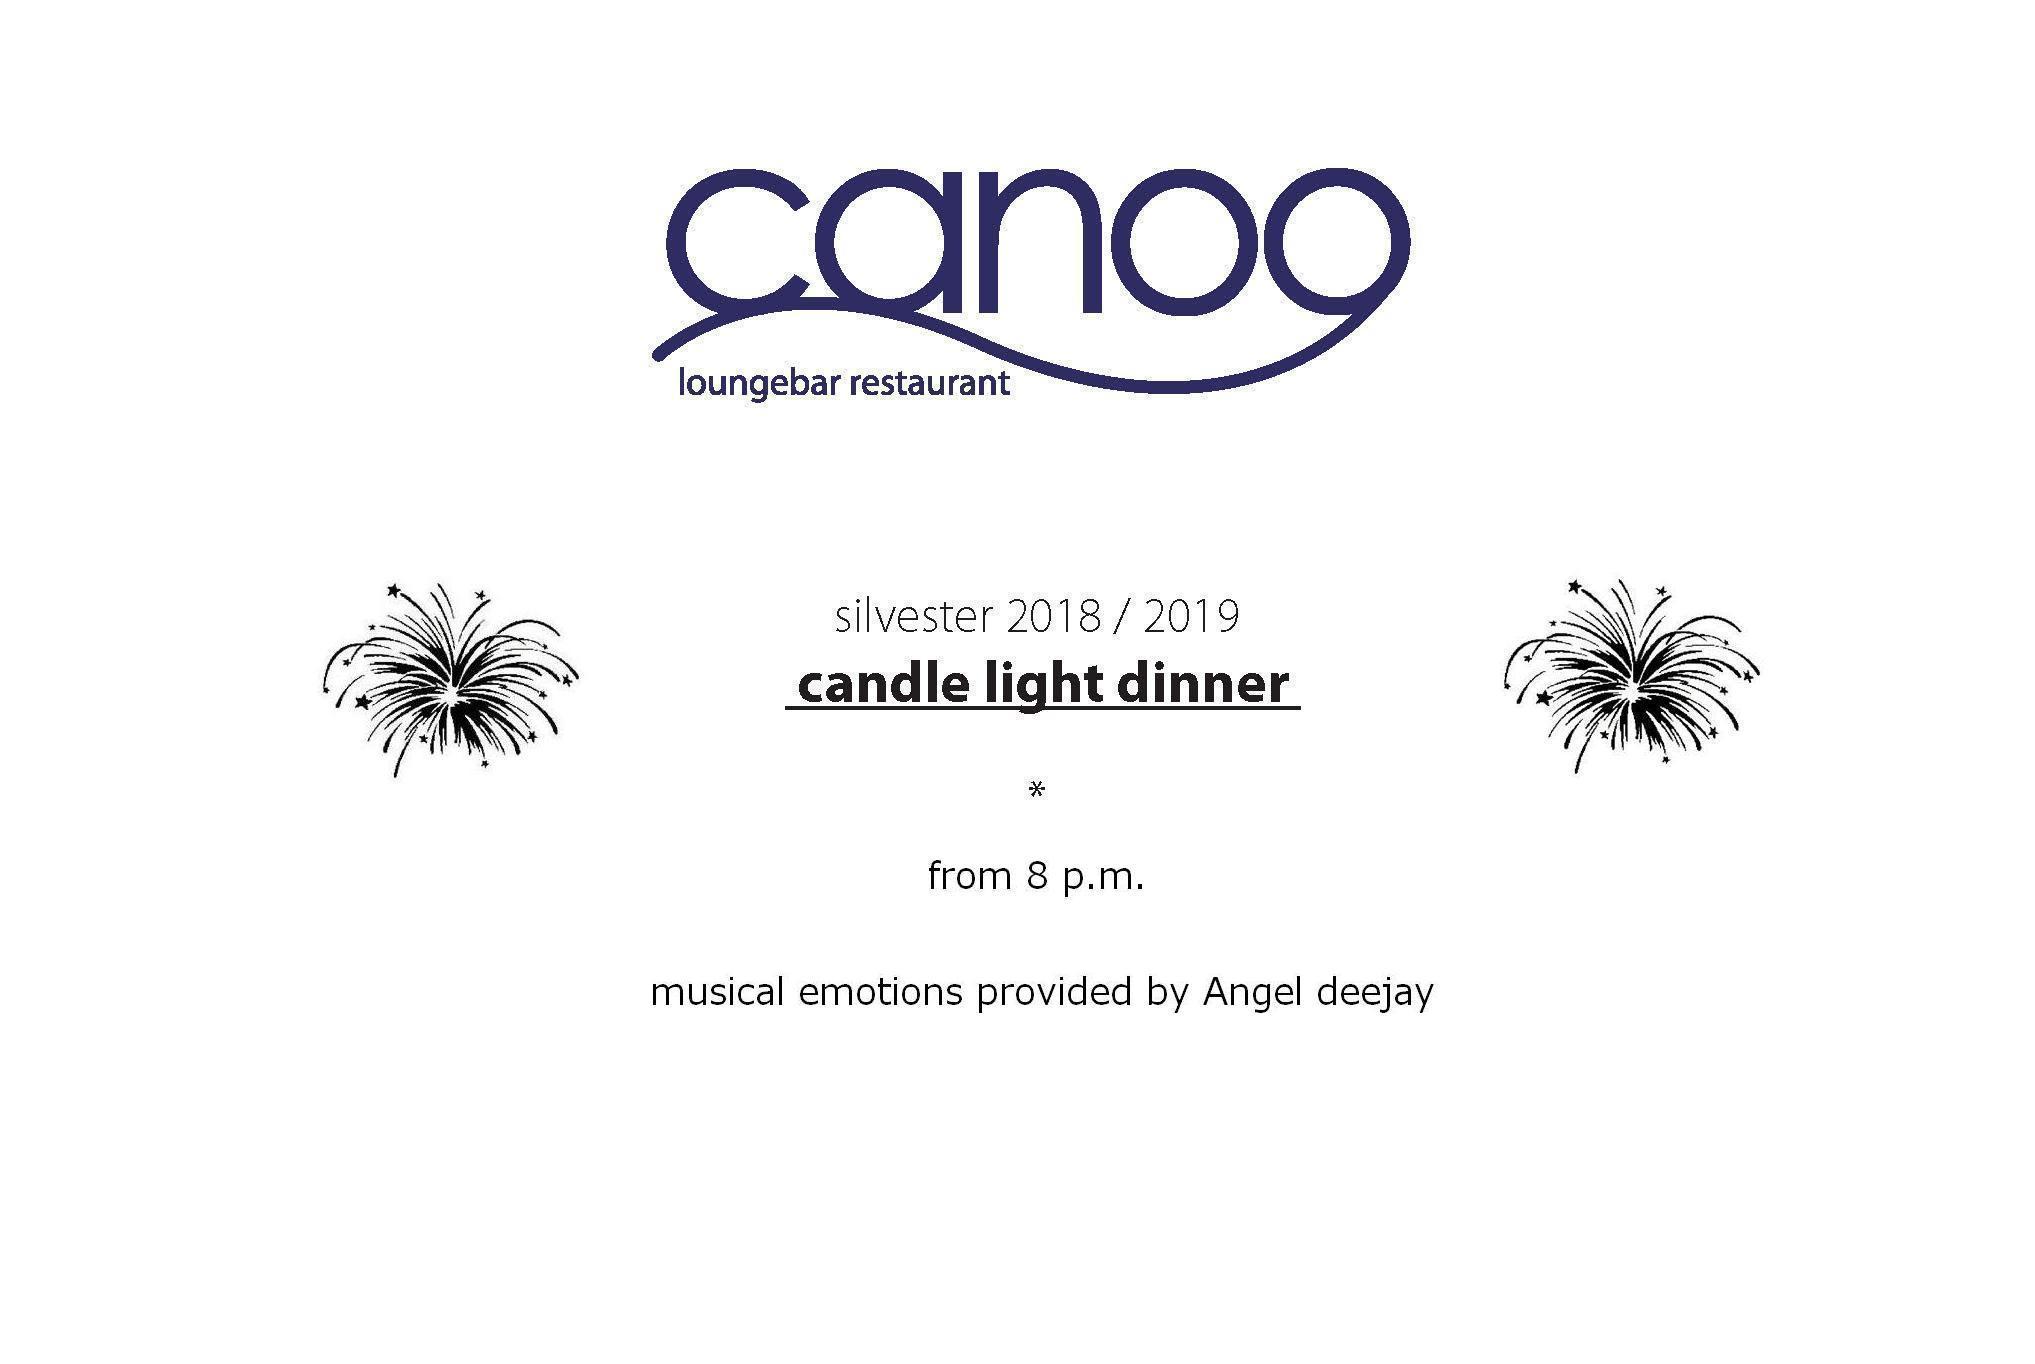 Flyer Canoo Silvester 2019